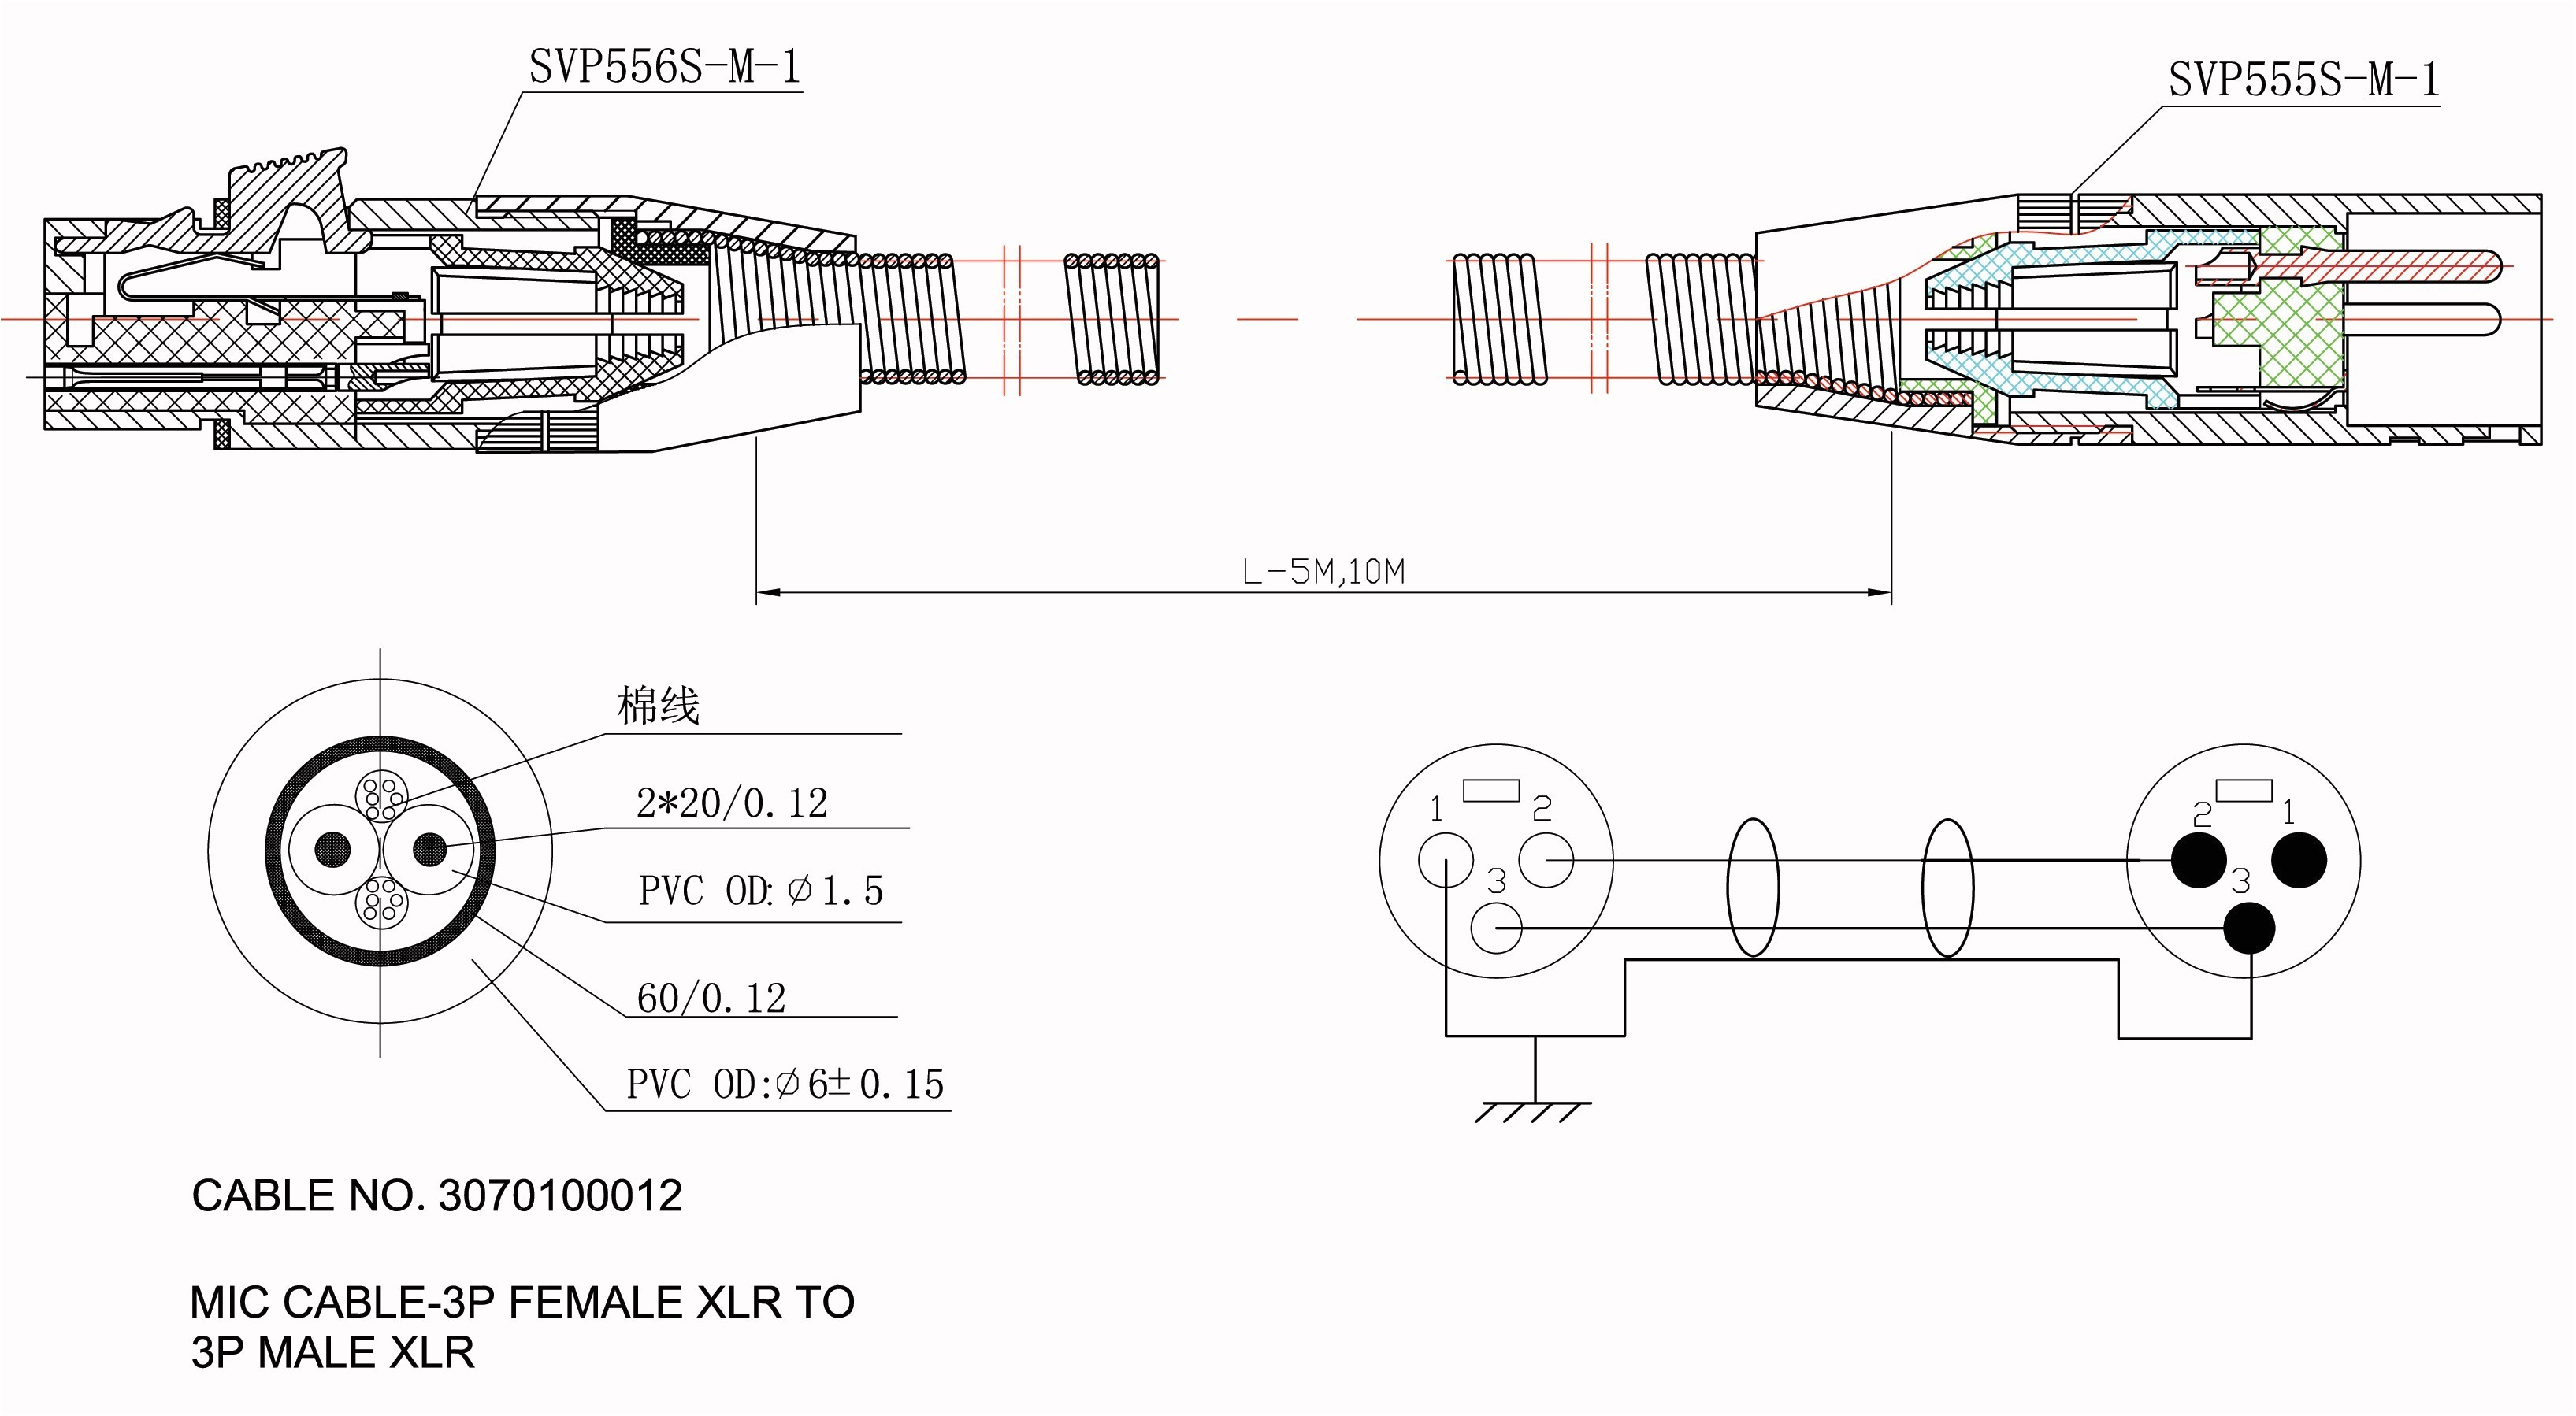 light bar wiring diagram agt manual e book code 3 led x 2100 wiring diagram